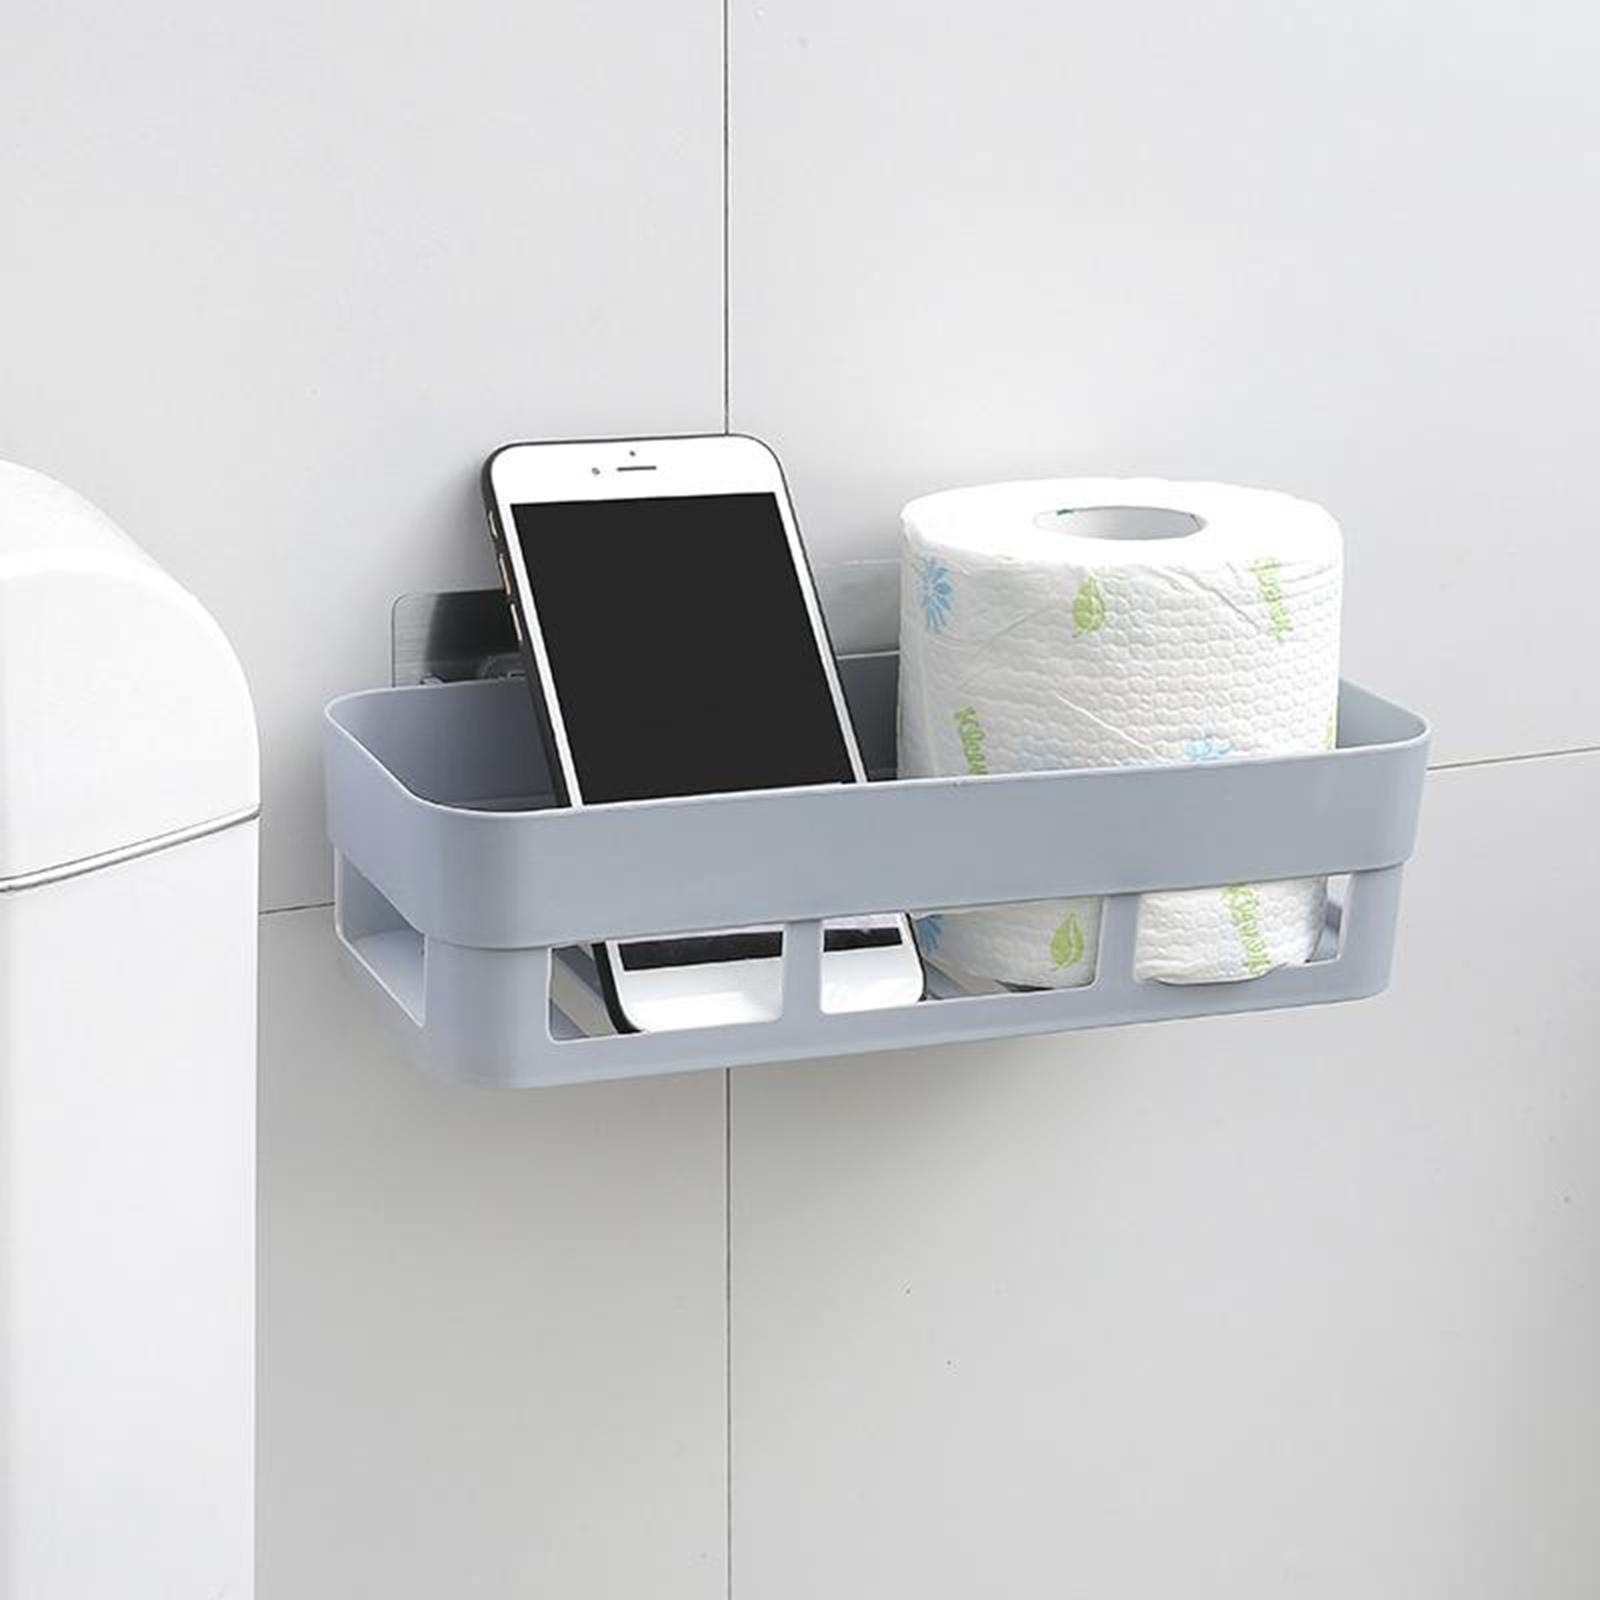 thumbnail 18 - Wall-Suction-Bathroom-Shelf-Shower-Caddy-Wall-Mount-Storage-Rack-Organizer